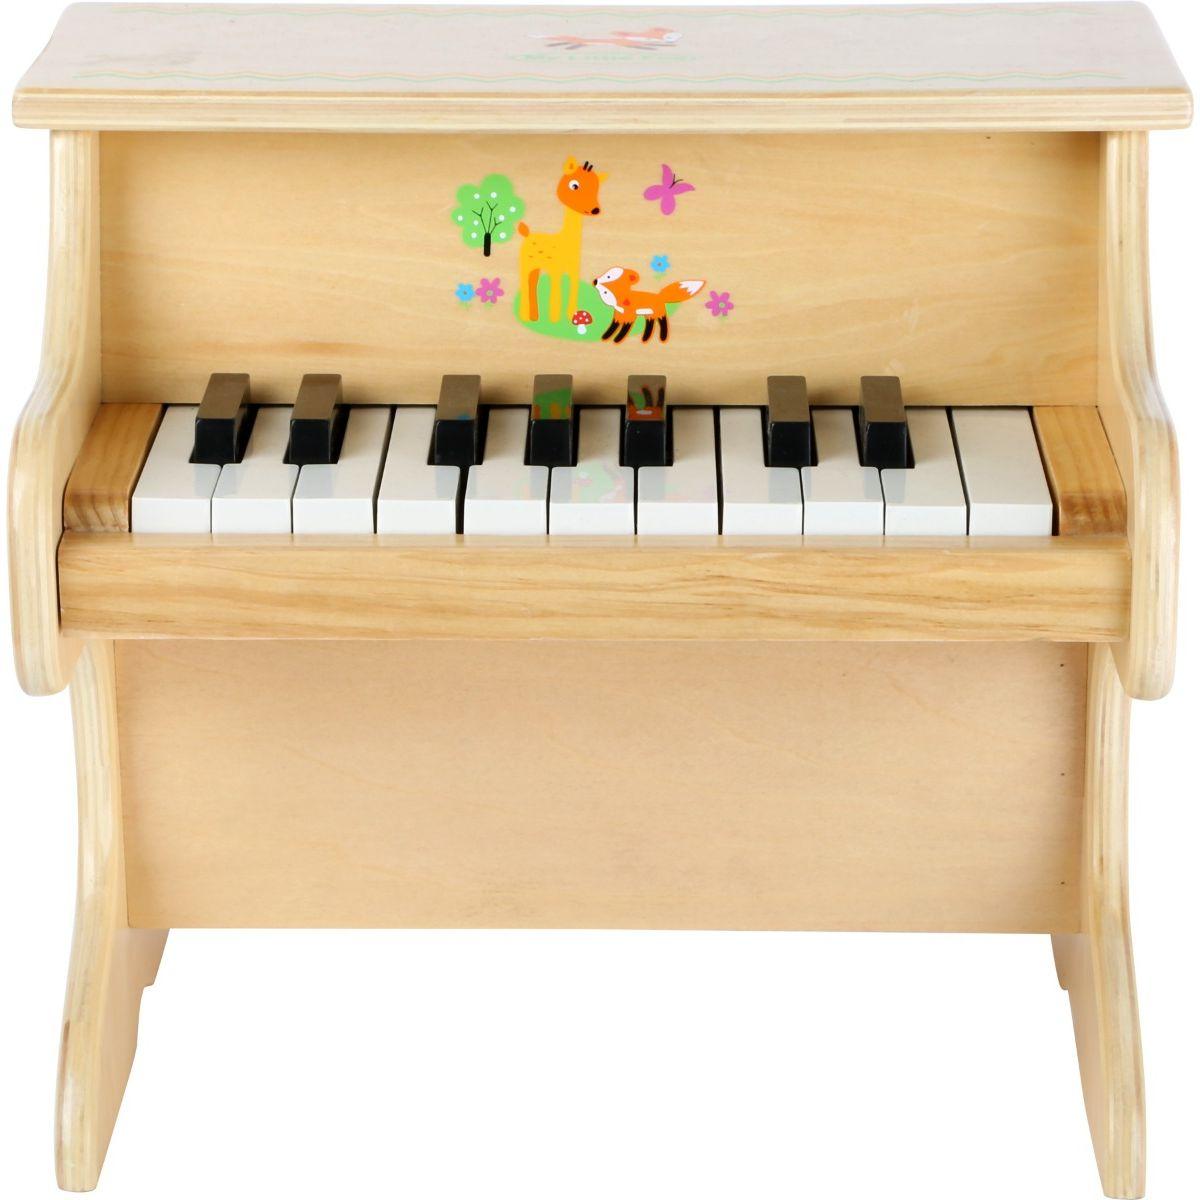 Madera Shopmami Juguete Legler De Piano Zorrito iOuPkZX